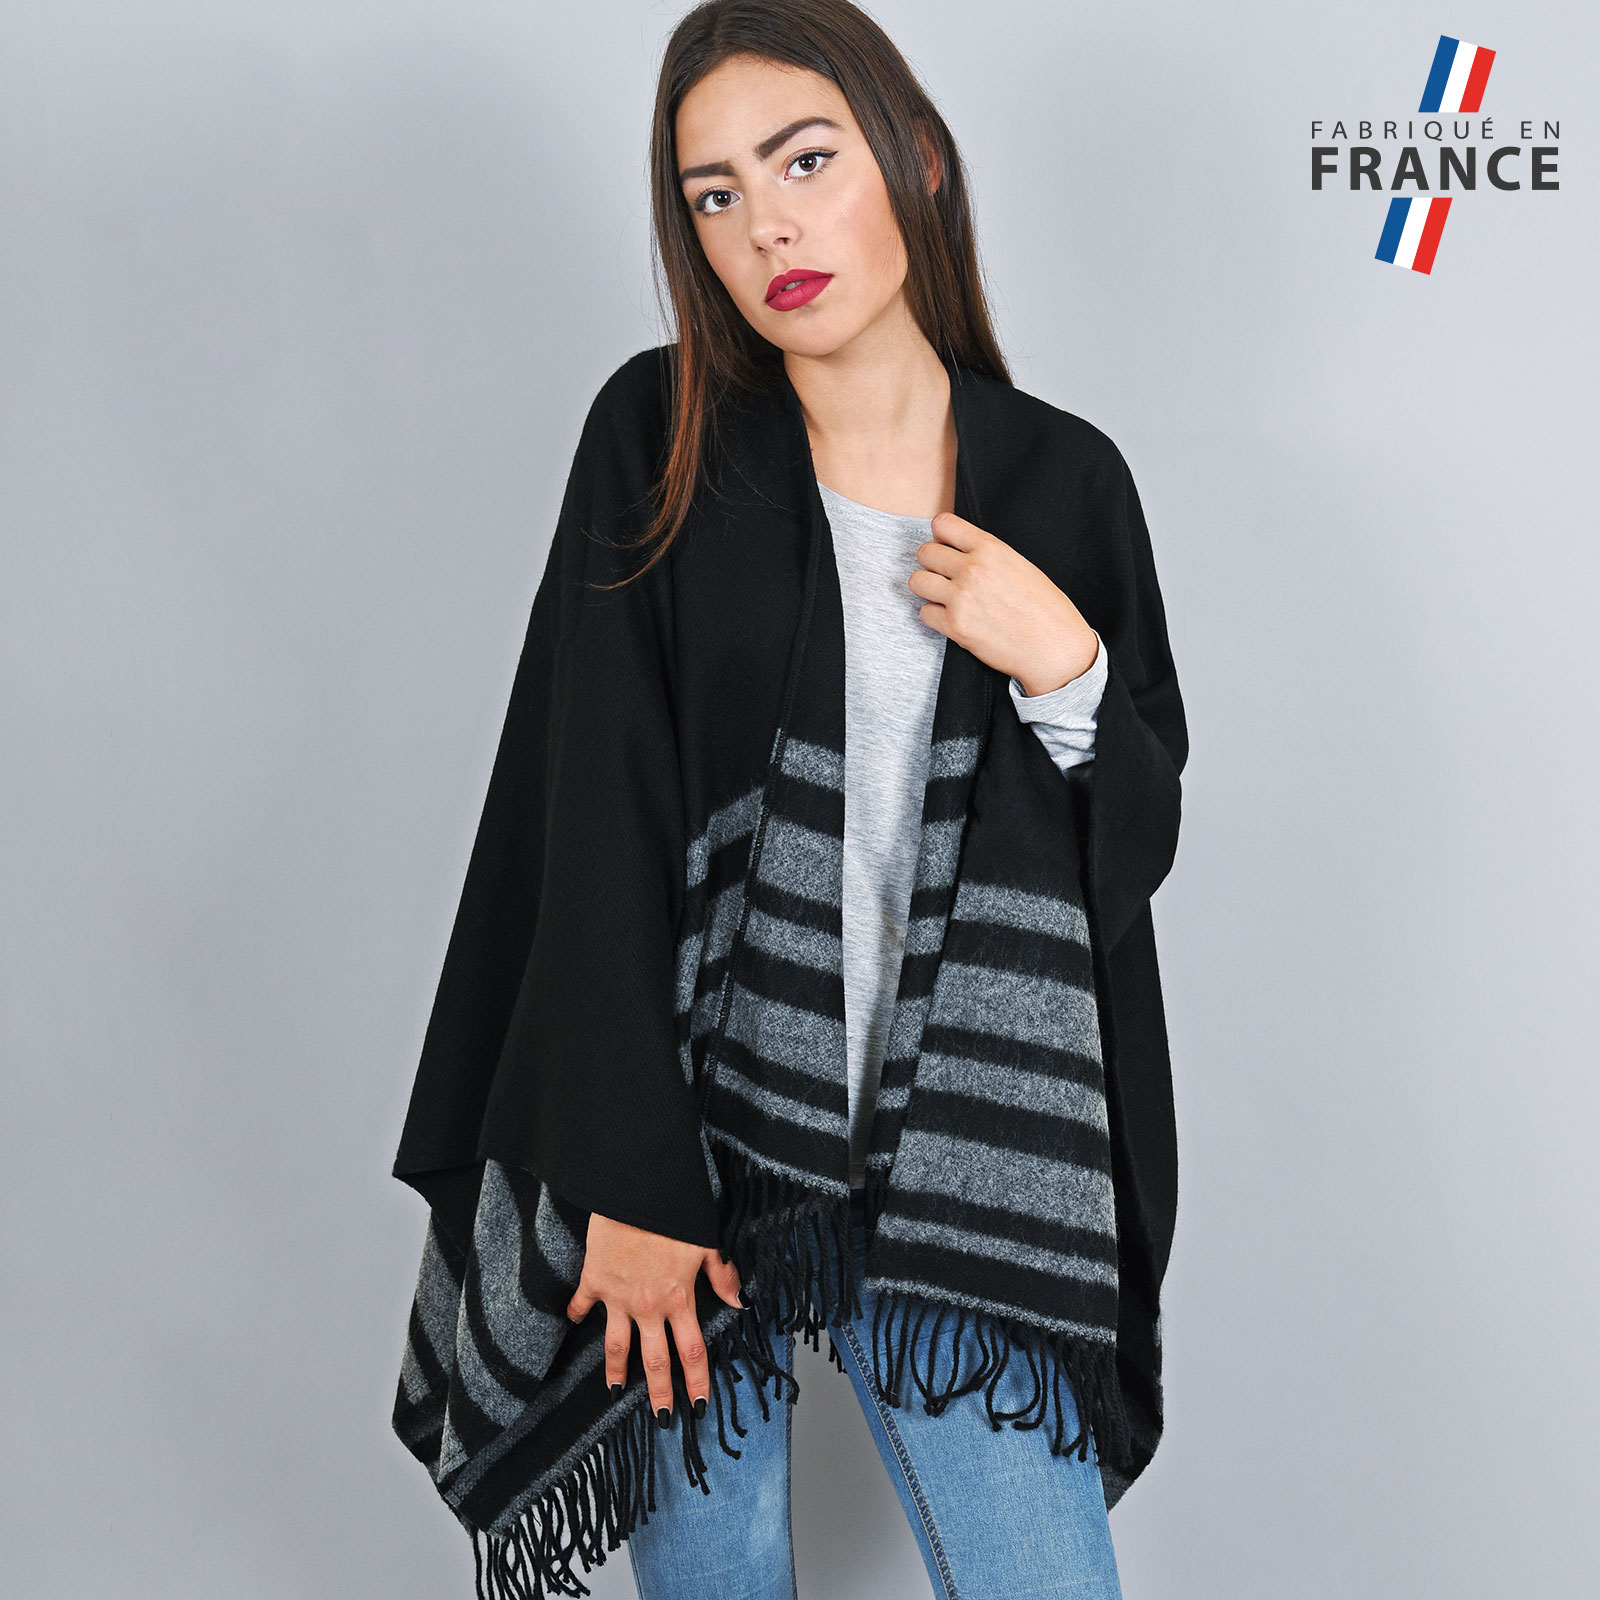 AT-03210-VF16-1-LB_FR-poncho-franges-a-rayures-noir-gris